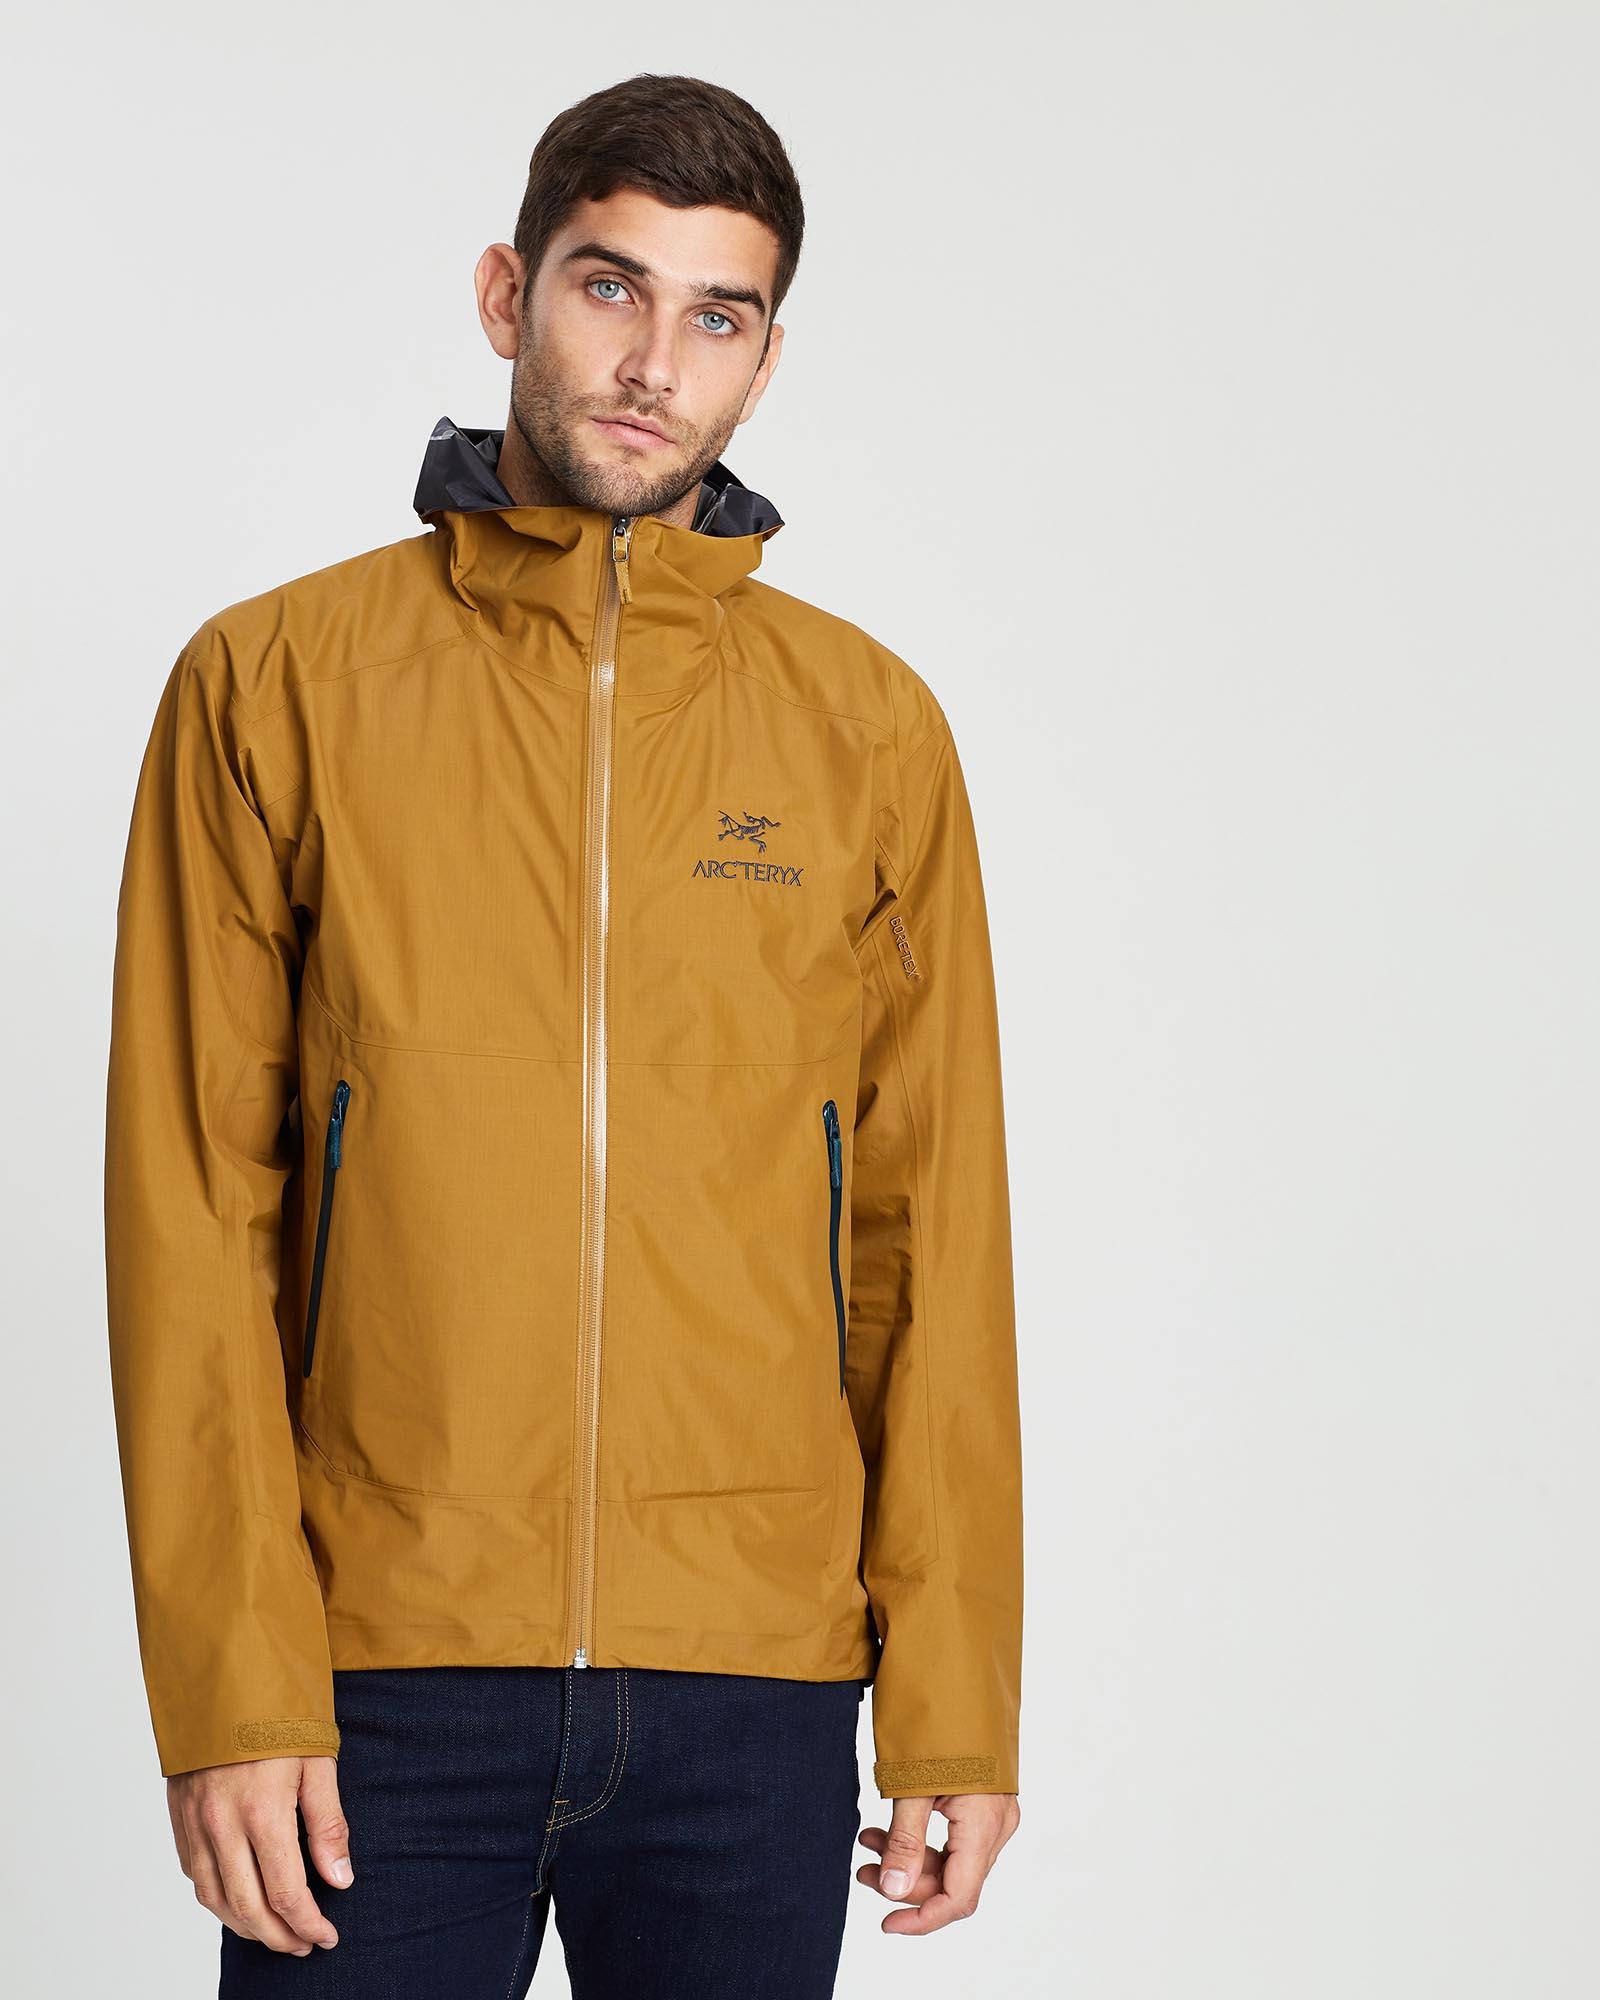 Best Hiking Jacket Arcteryx Rain Review